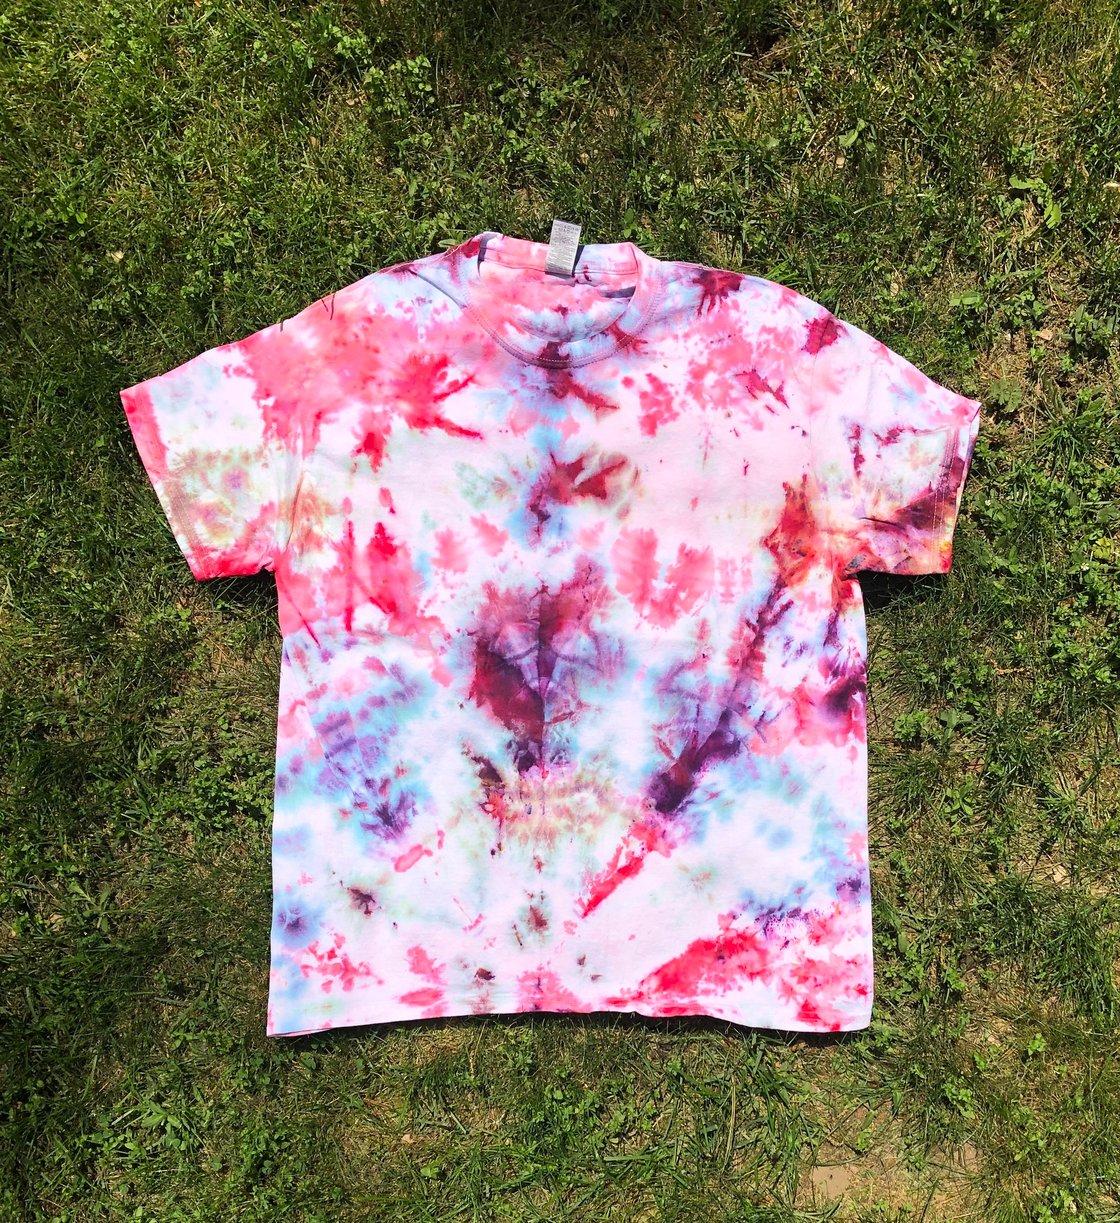 Image of Unprinted Tie-Dye Shirts